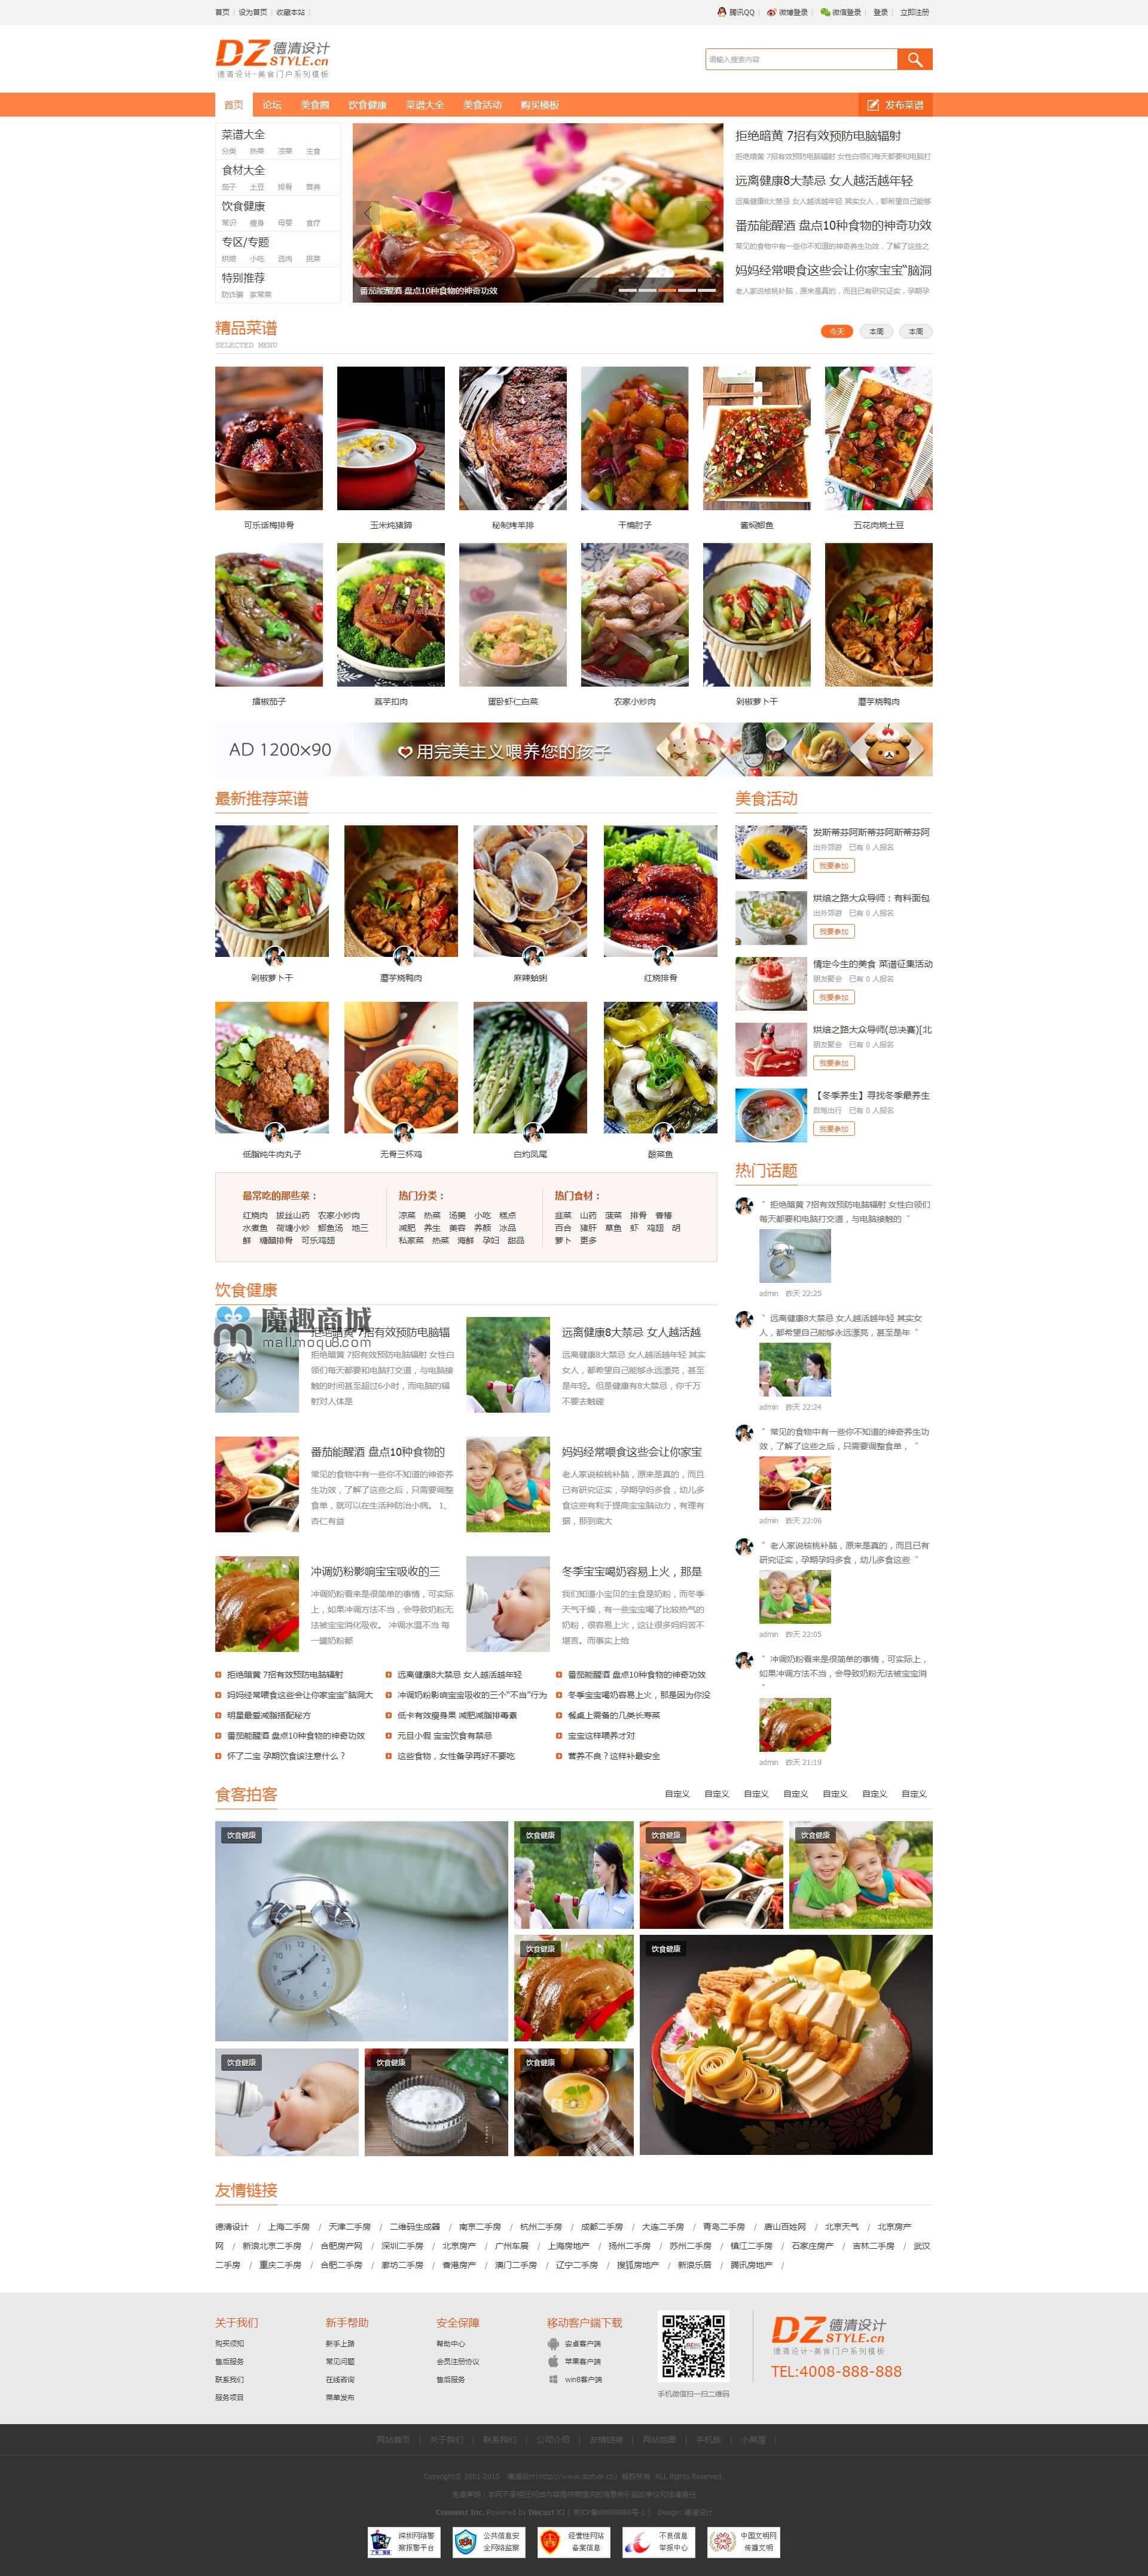 <font color='#44BB44'>美食门户系列一收费版UTF+GBK</font>